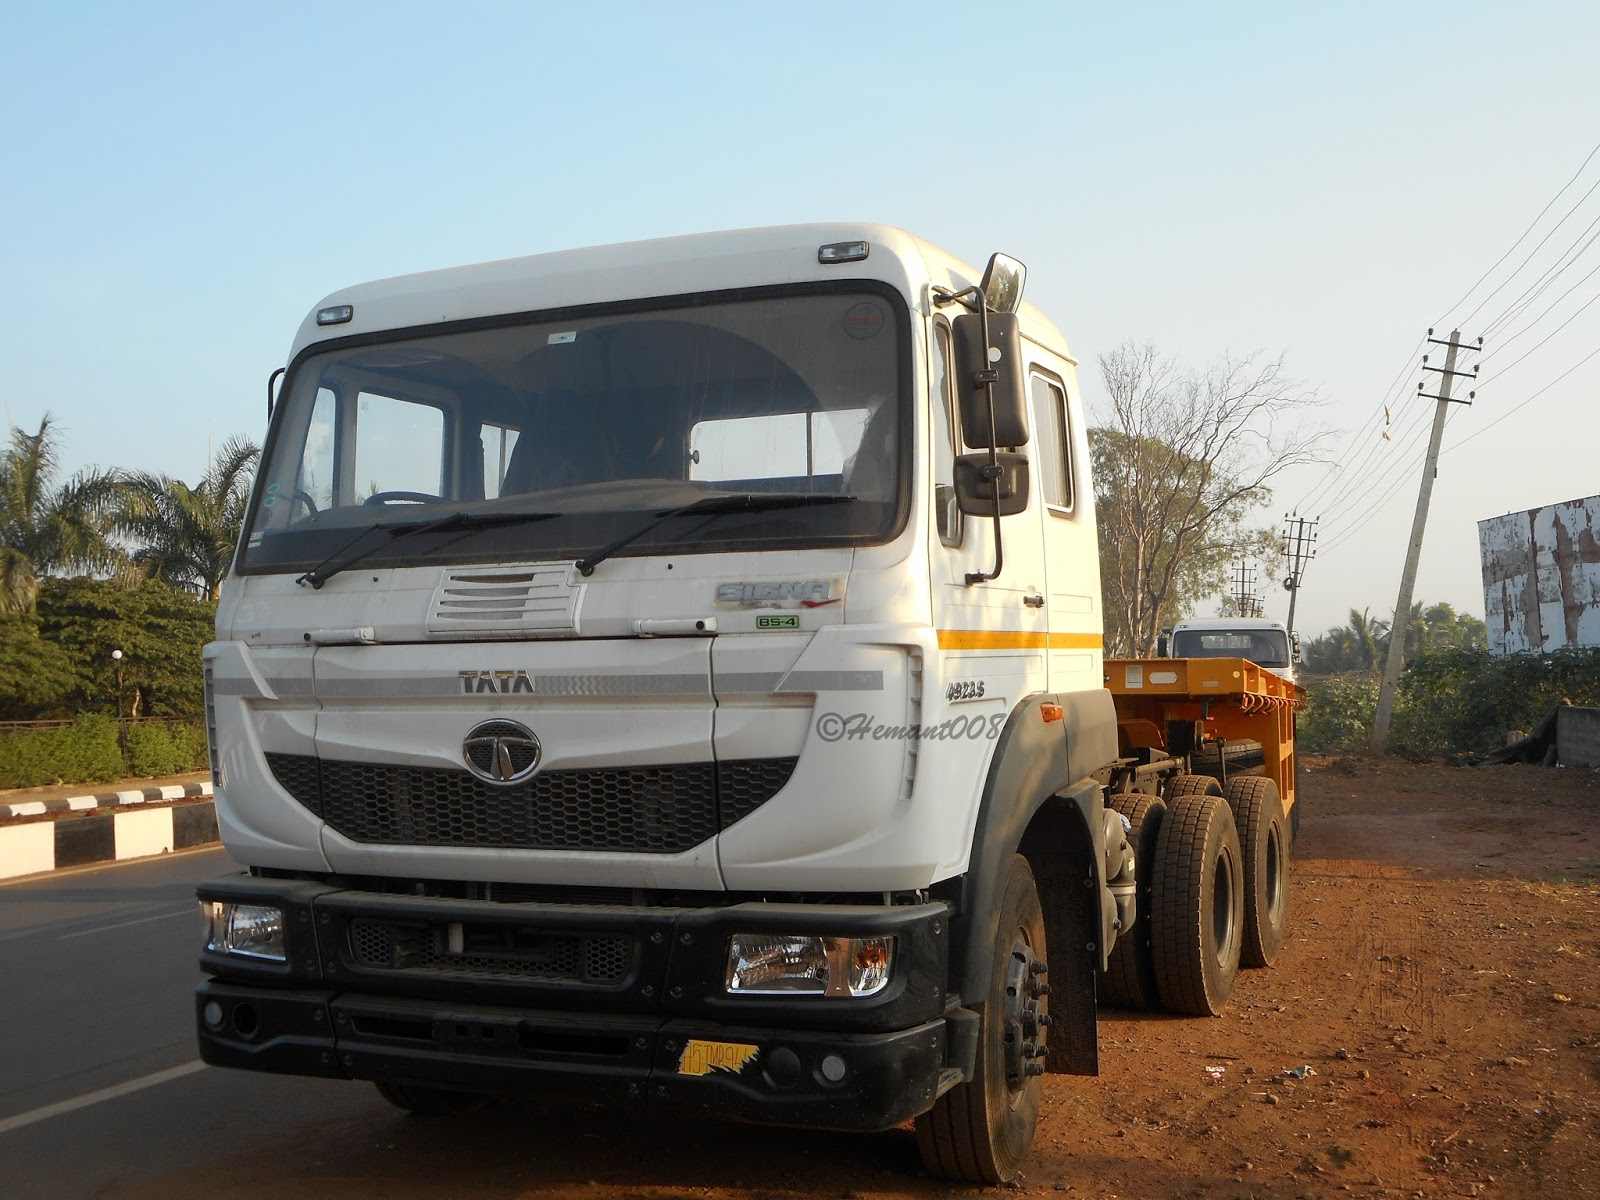 Hemant AutoclickZ : Brand new Tata Signa 4923.S Tractor Trailer With Tata DLT Trailer